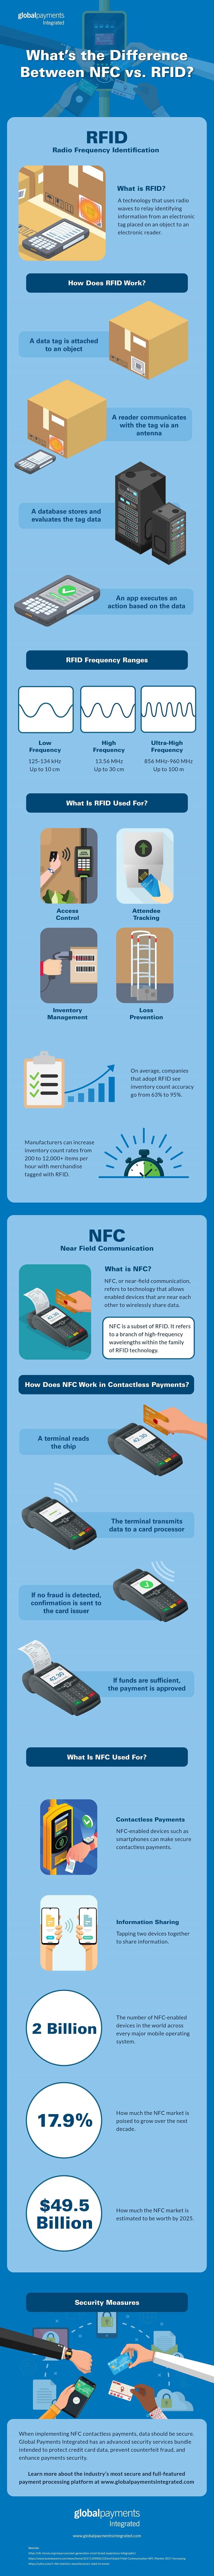 NFC vs RFID infographic